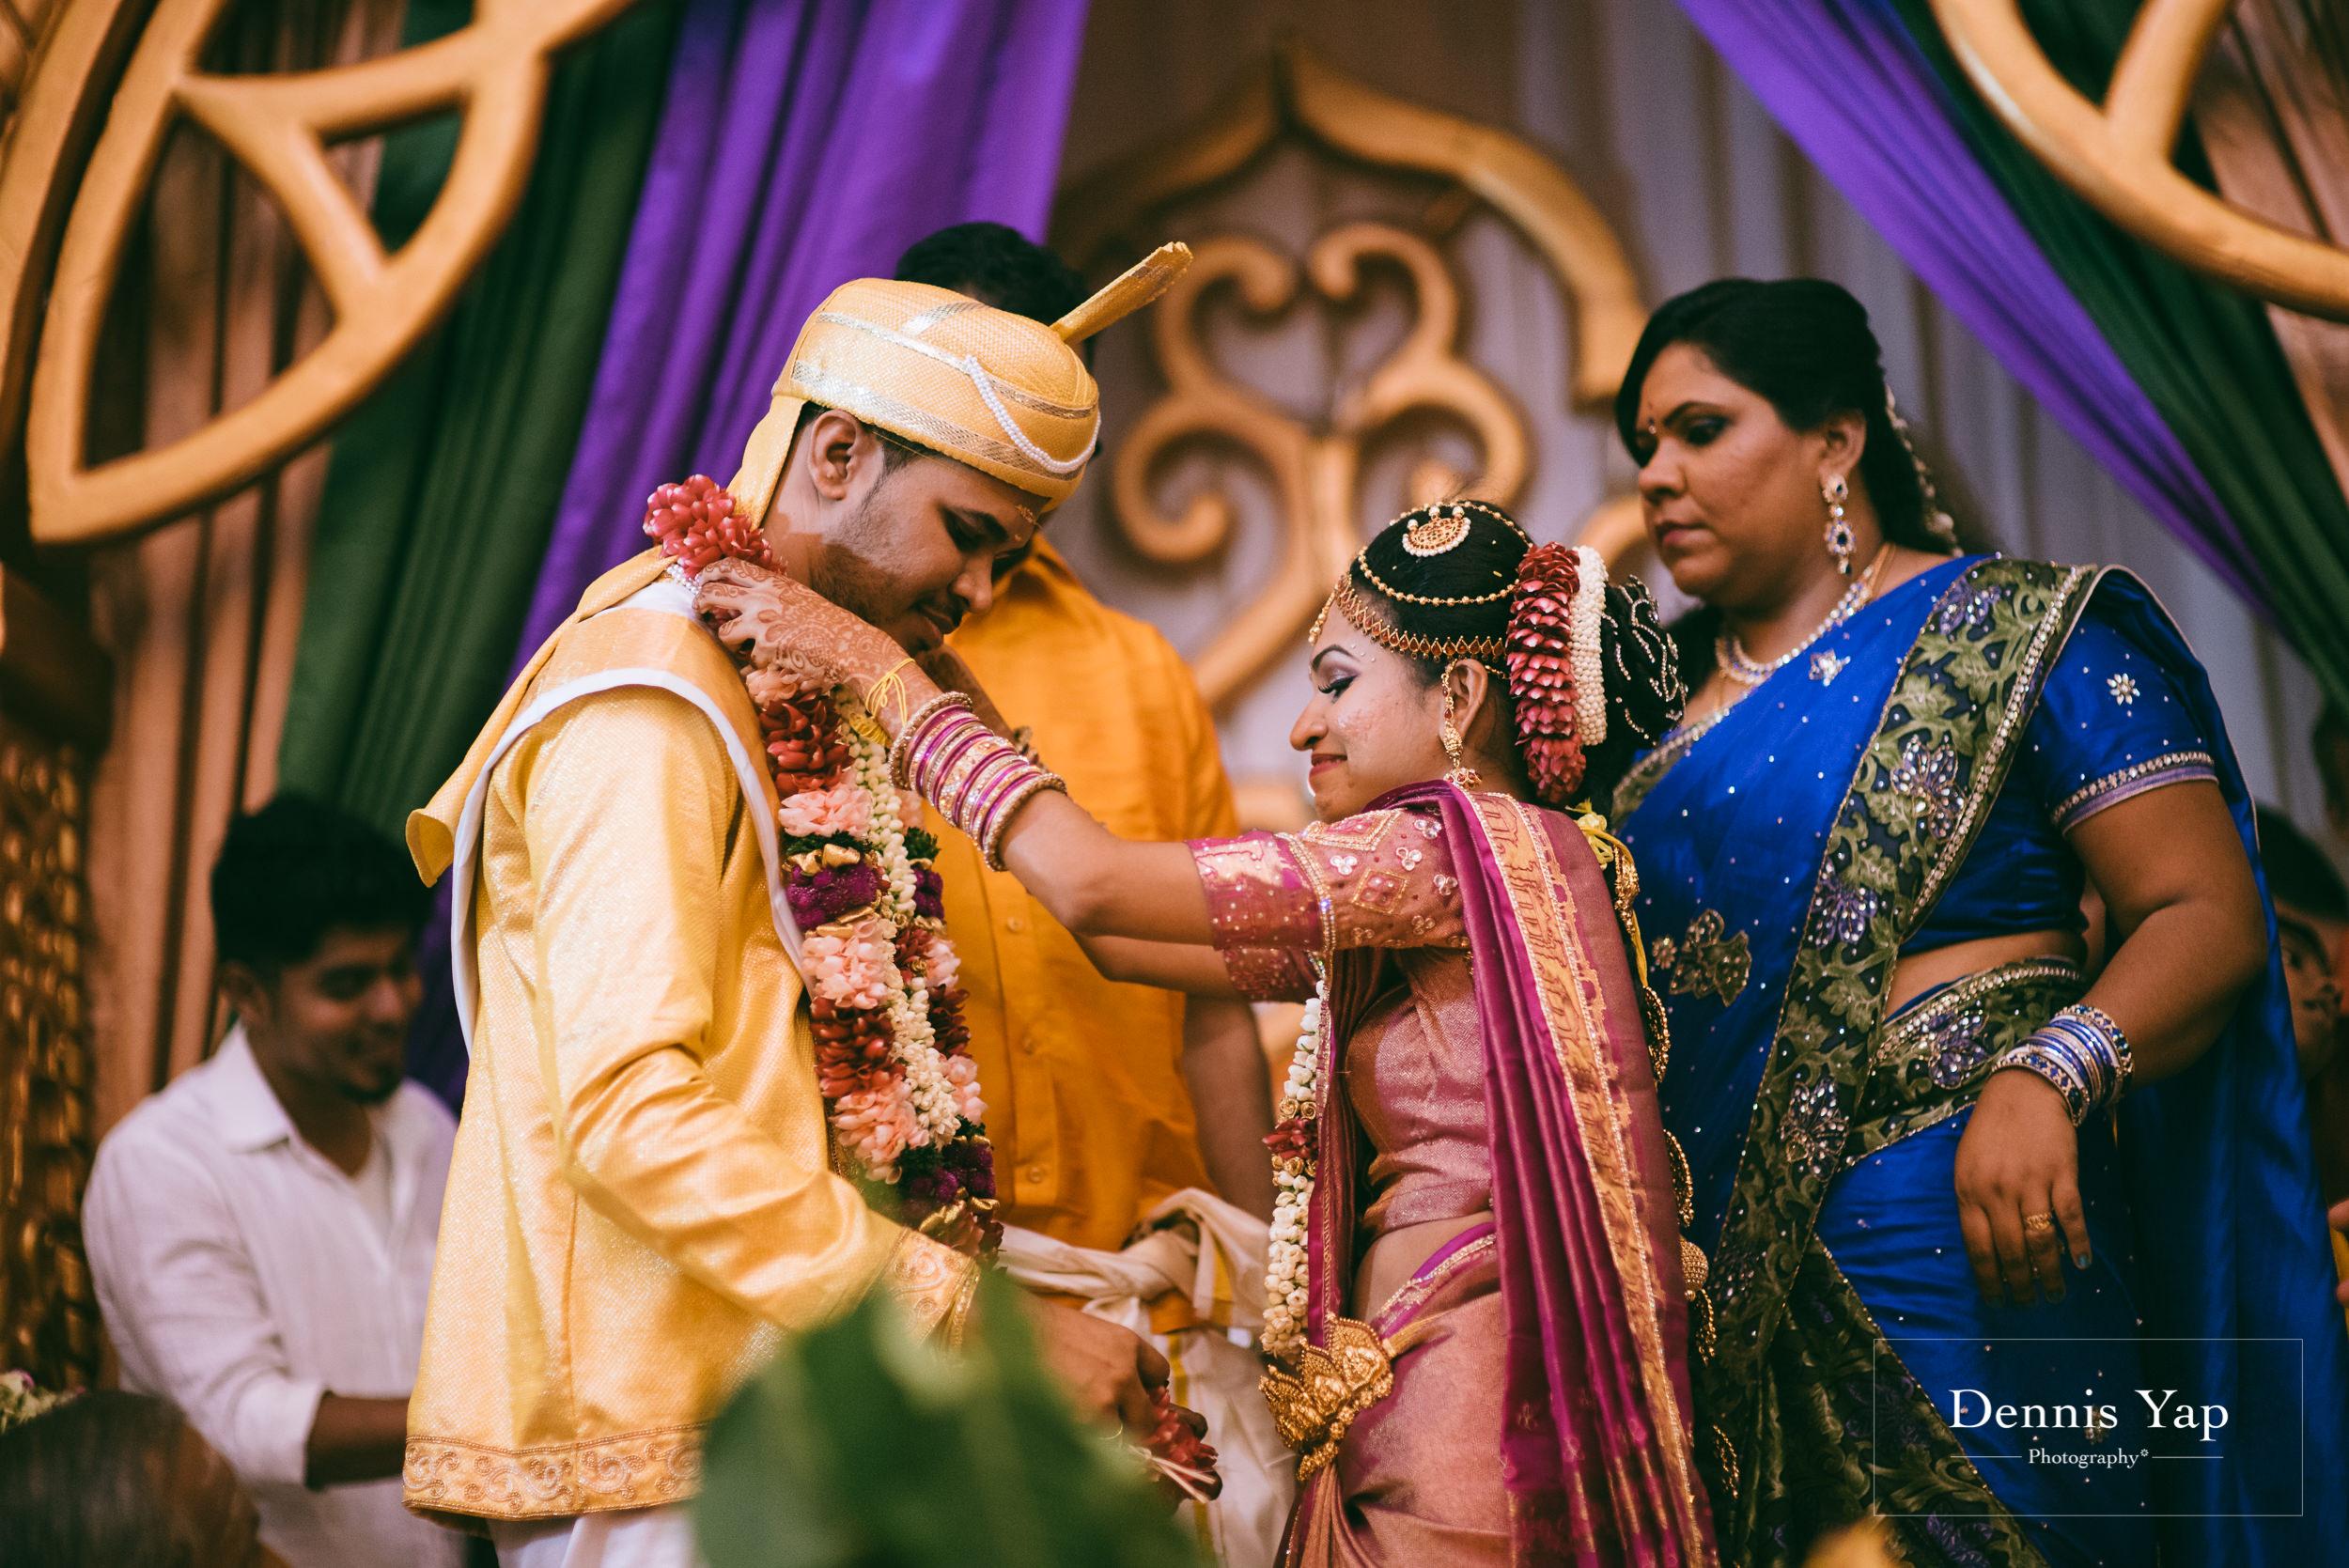 puvaneswaran cangitaa indian wedding ceremony ideal convention dennis yap photography malaysia-25.jpg